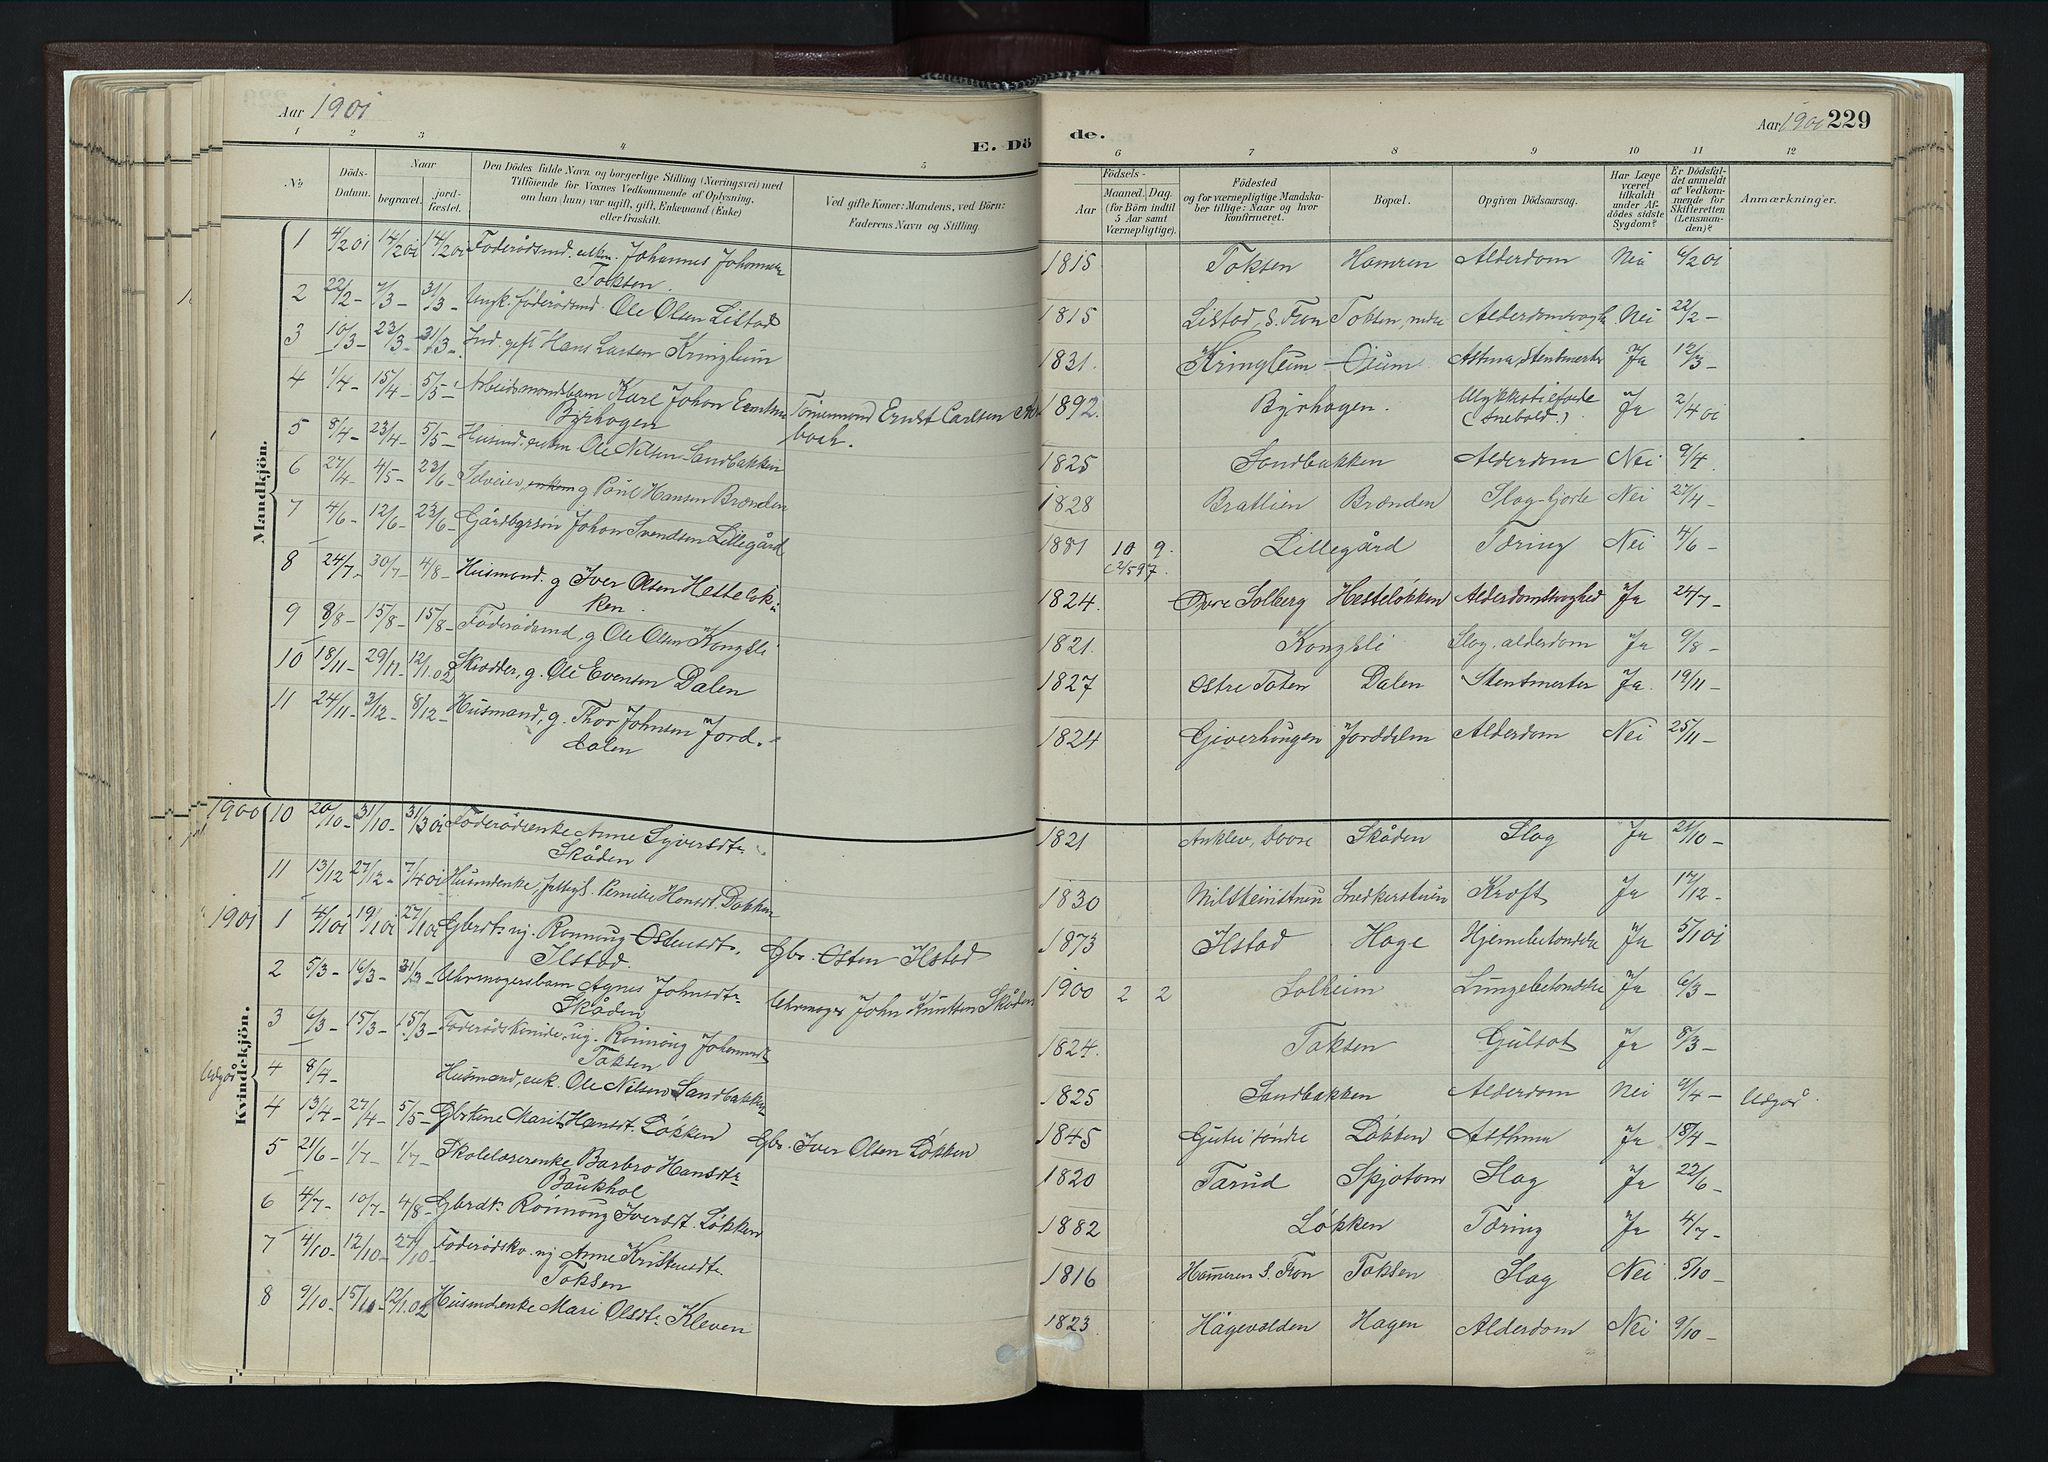 SAH, Nord-Fron prestekontor, Ministerialbok nr. 4, 1884-1914, s. 229